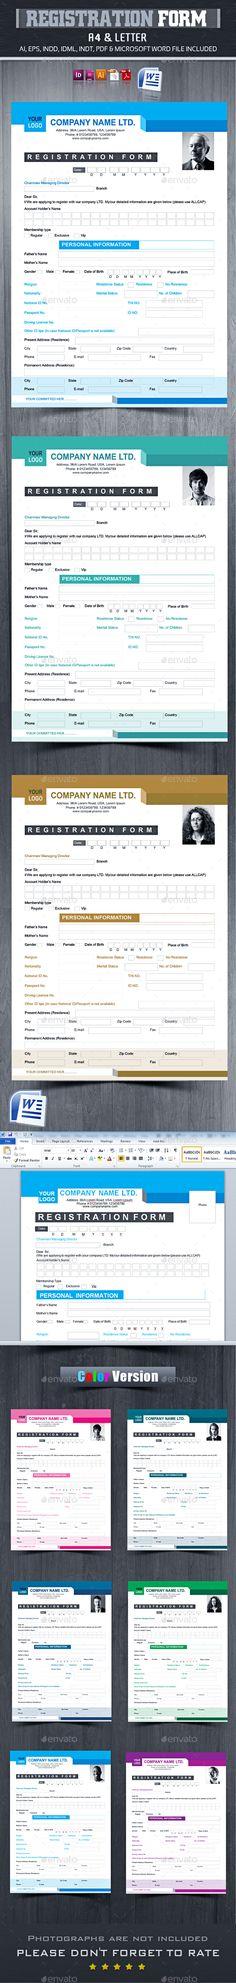 Registration Form V_04 Registration form, Photoshop and Print - membership forms templates